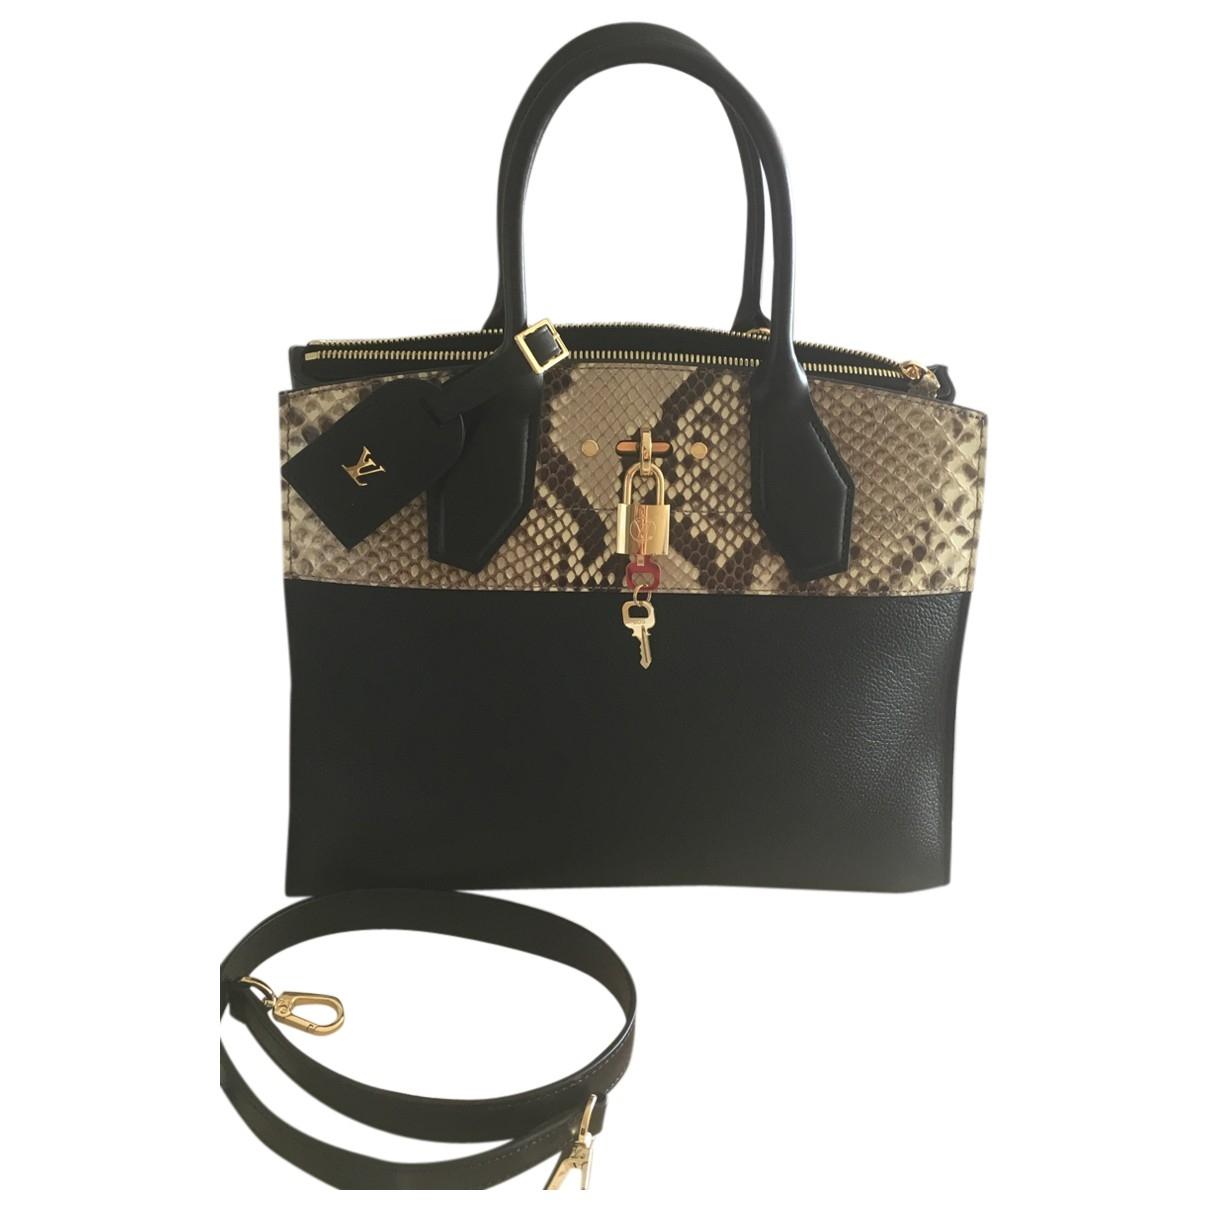 Louis Vuitton - Sac a main City Steamer pour femme en cuir - noir